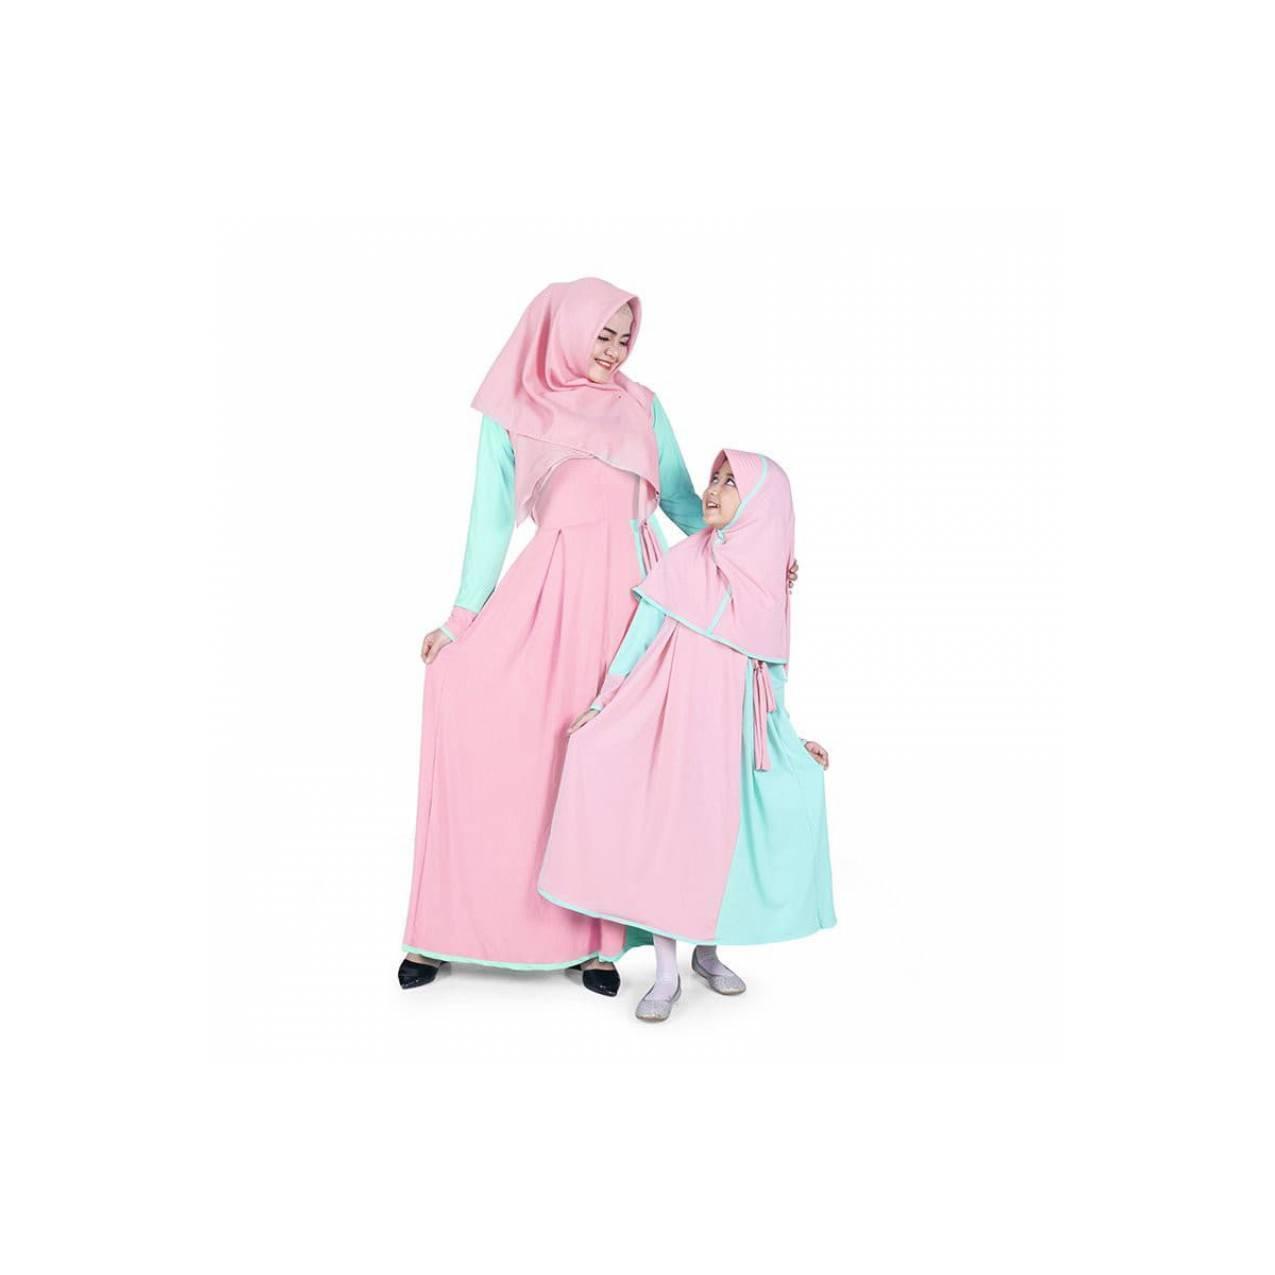 ORI... BAJUYULI - Baju Muslim Couple Gamis Ibu dan Anak Jersey - Mint